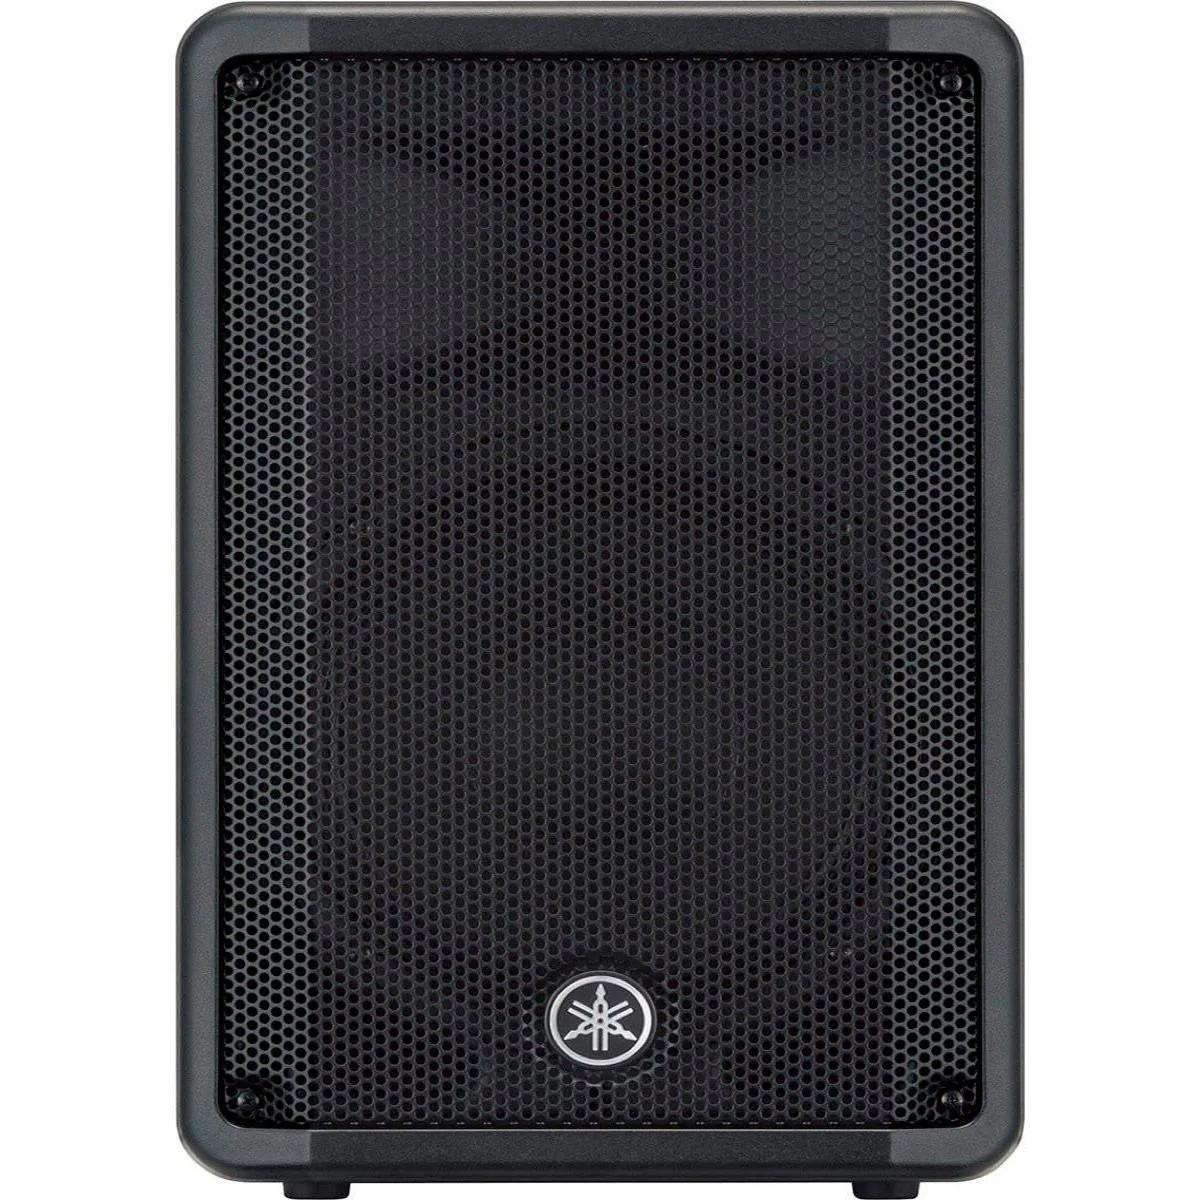 Caixa Acústica Ativa Yamaha DBR12 1x12